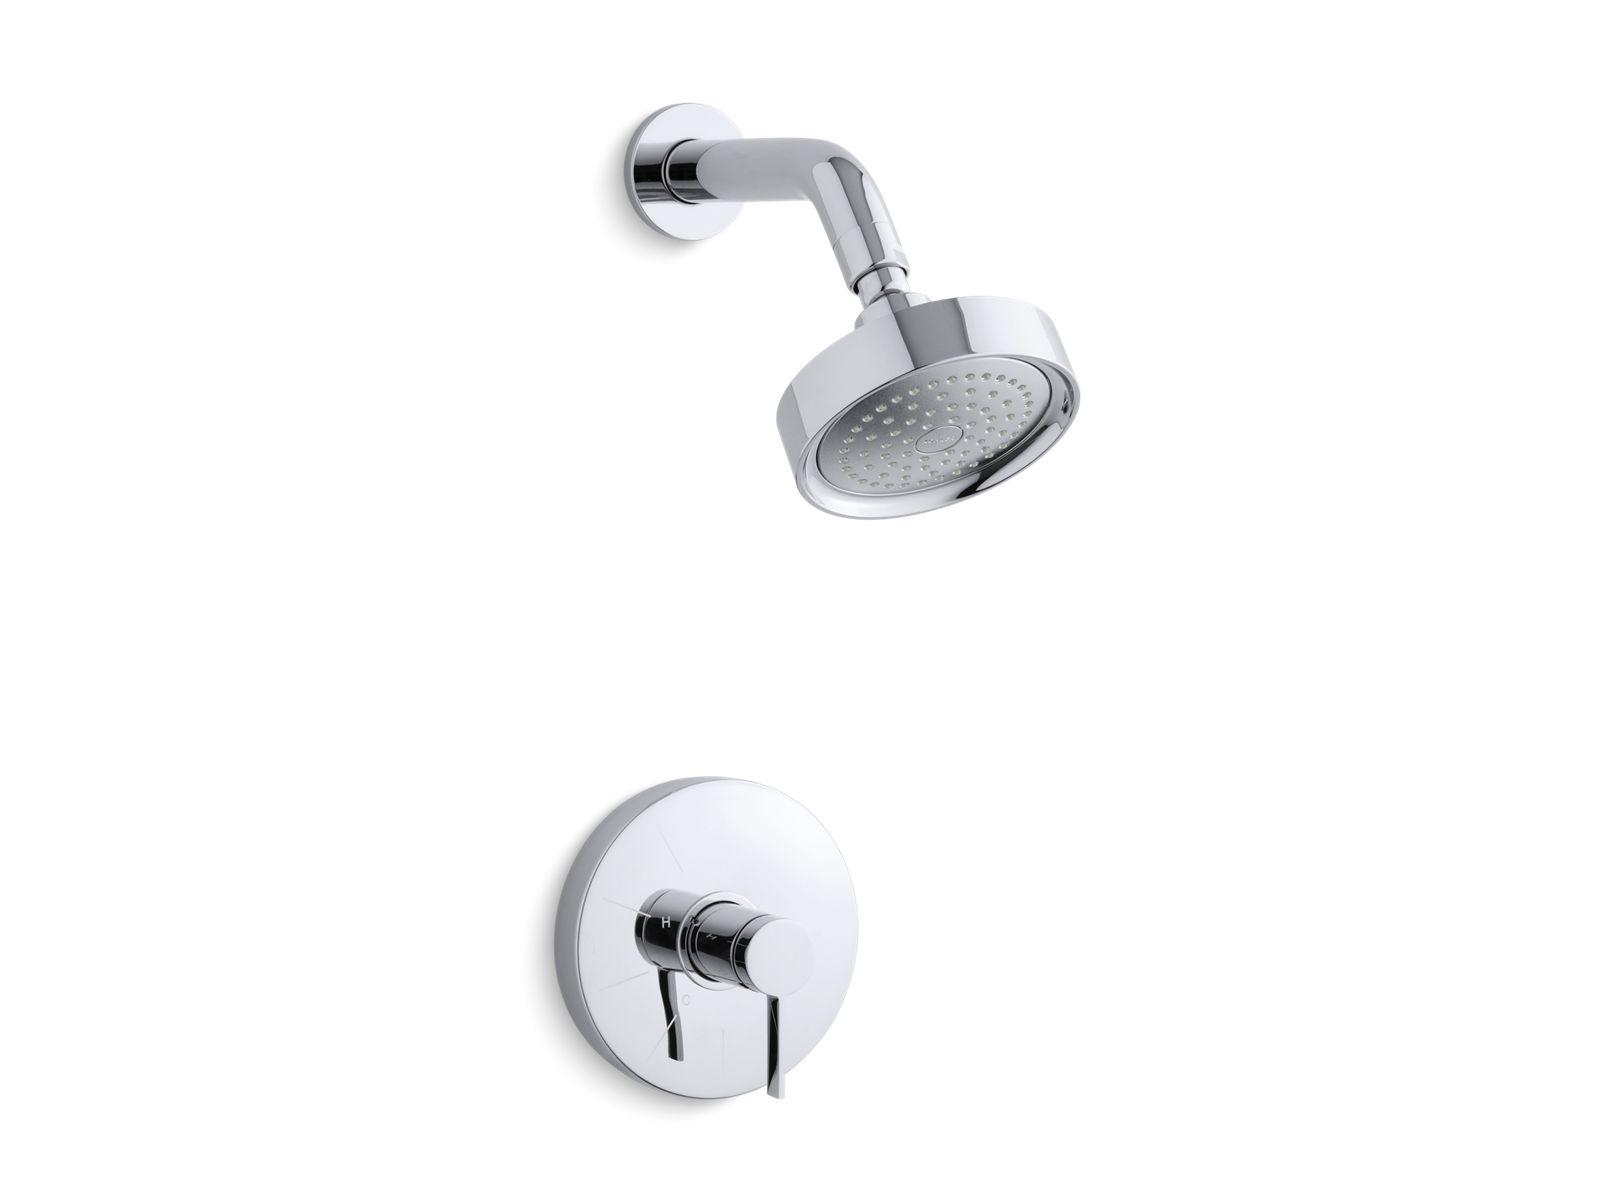 kts9494 stillness ritetemp shower valve trim with lever handle and 25 gpm showerhead kohler